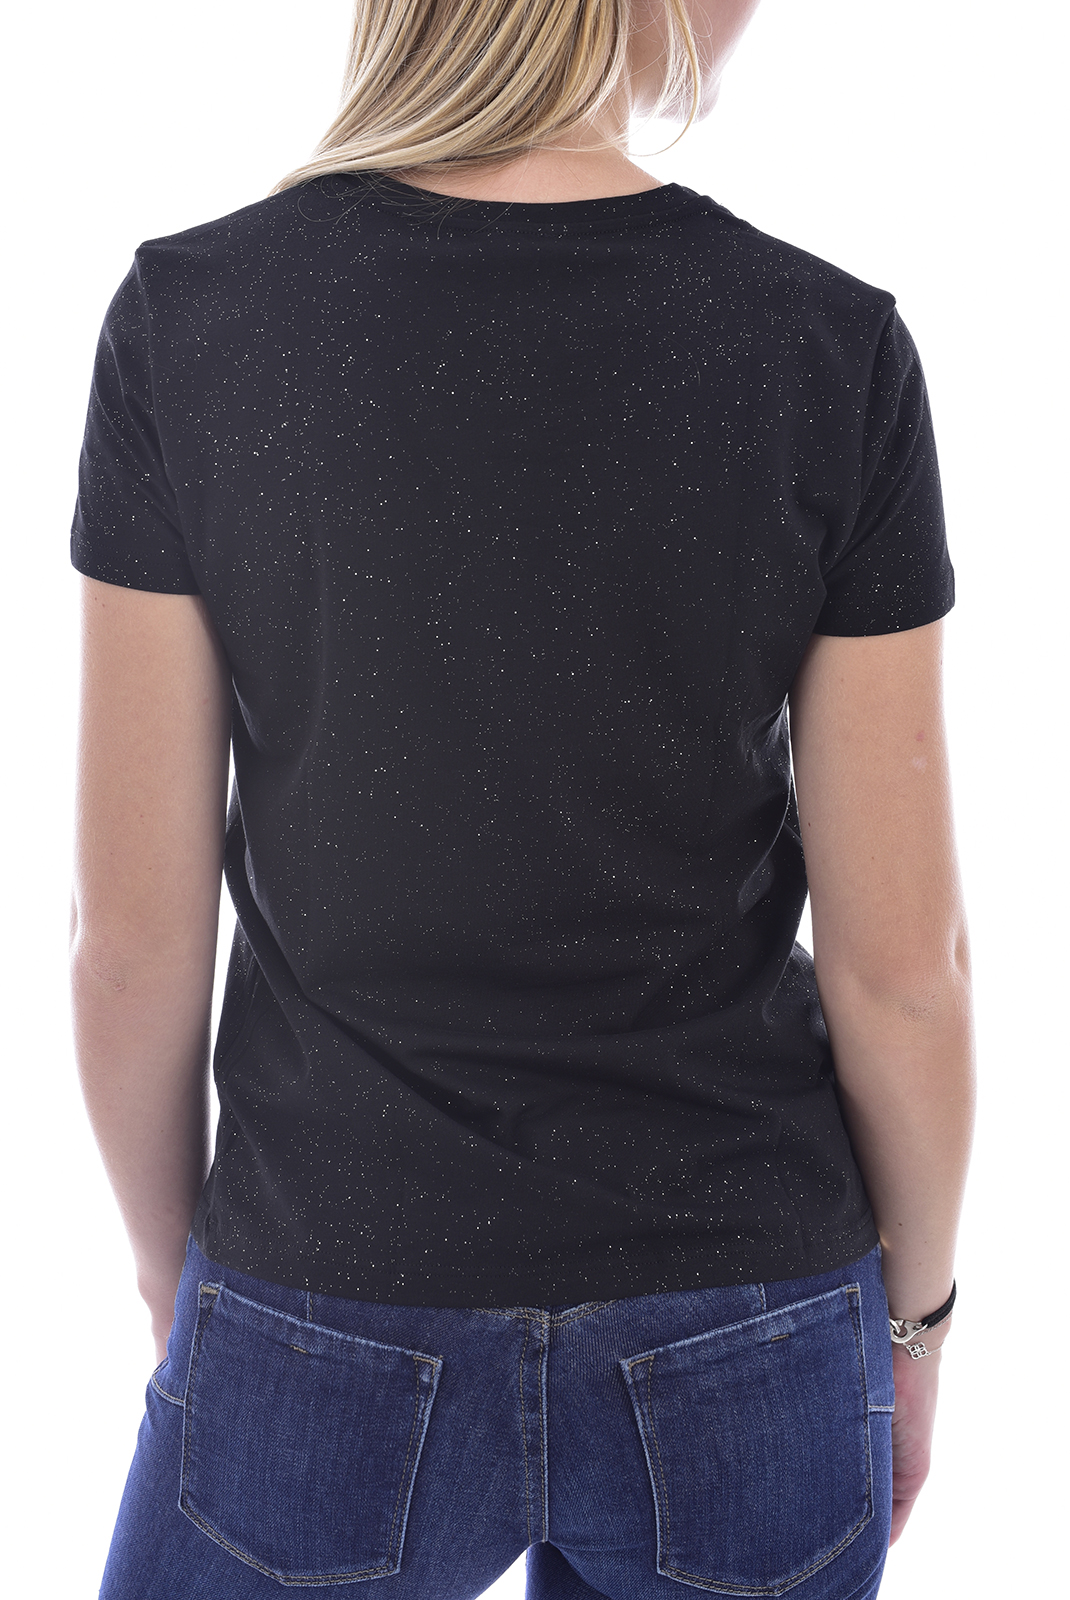 Tee shirt  Emporio armani 164272 0A225 020 BLACK